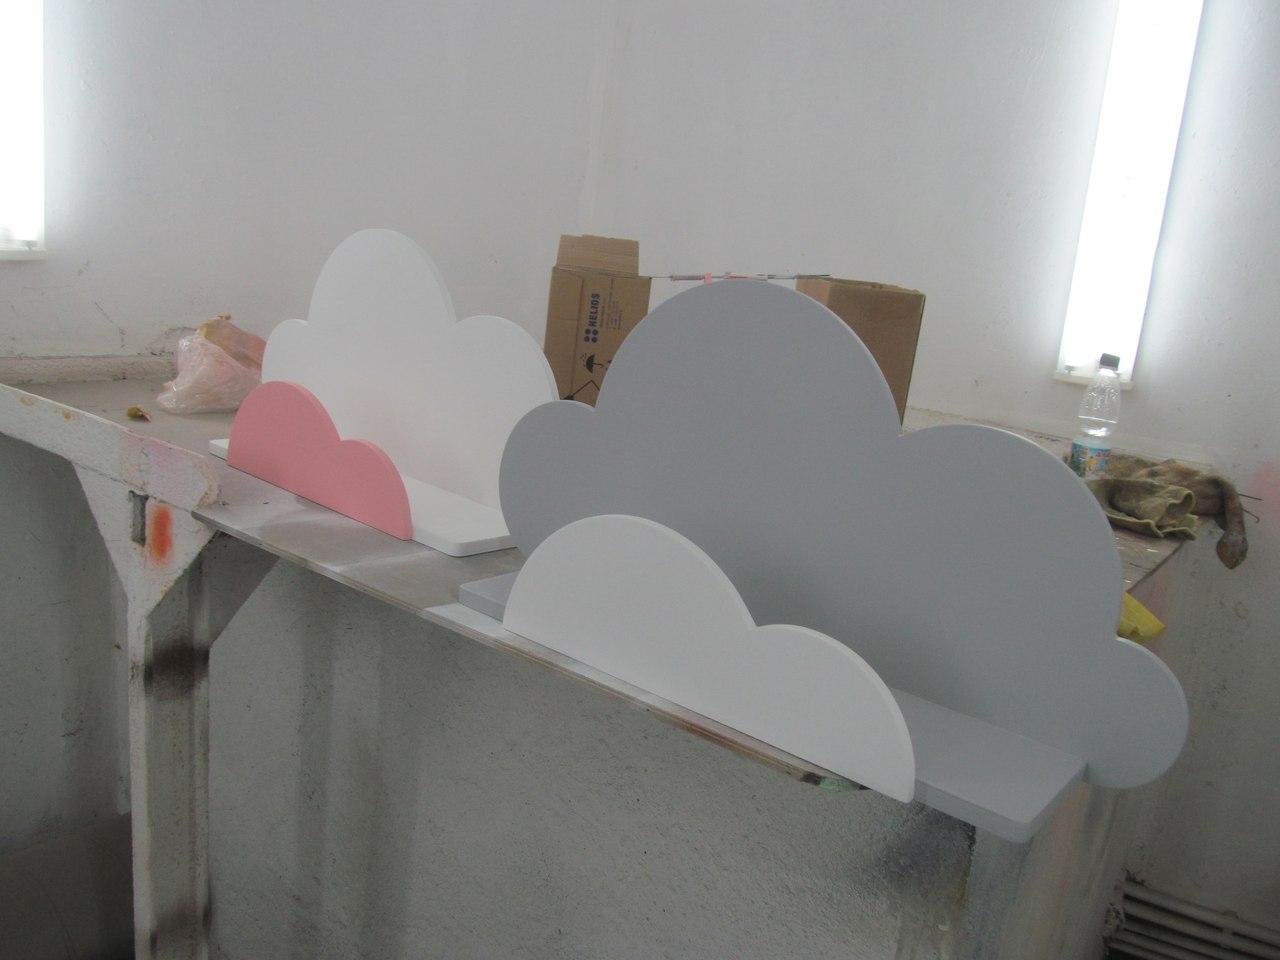 Laser Cut Plywood Shelf 10mm 15mm Clouds 3d Puzzle Free CDR Vectors Art